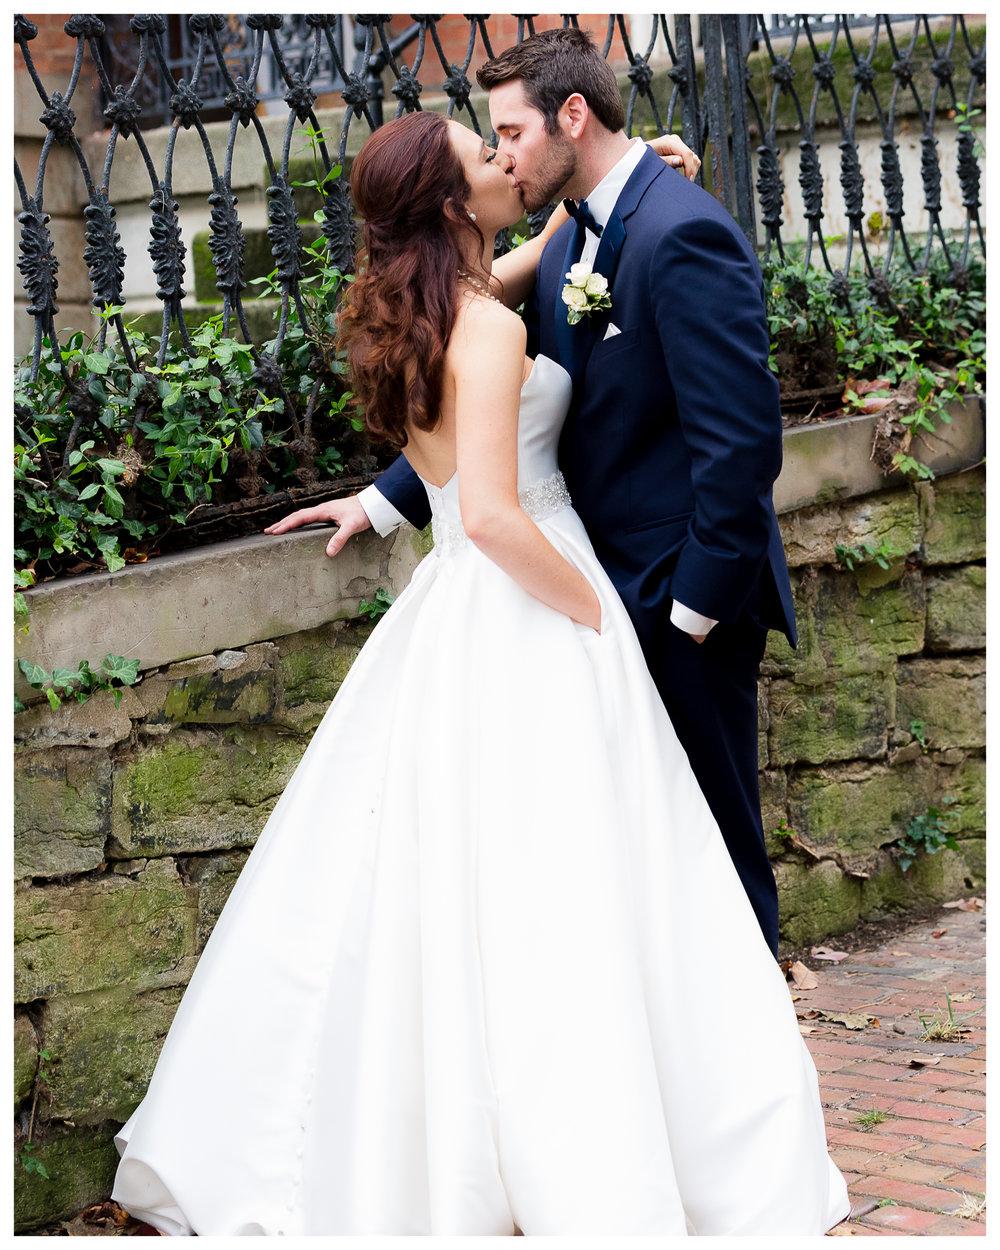 George Rogers Clark Park Wedding